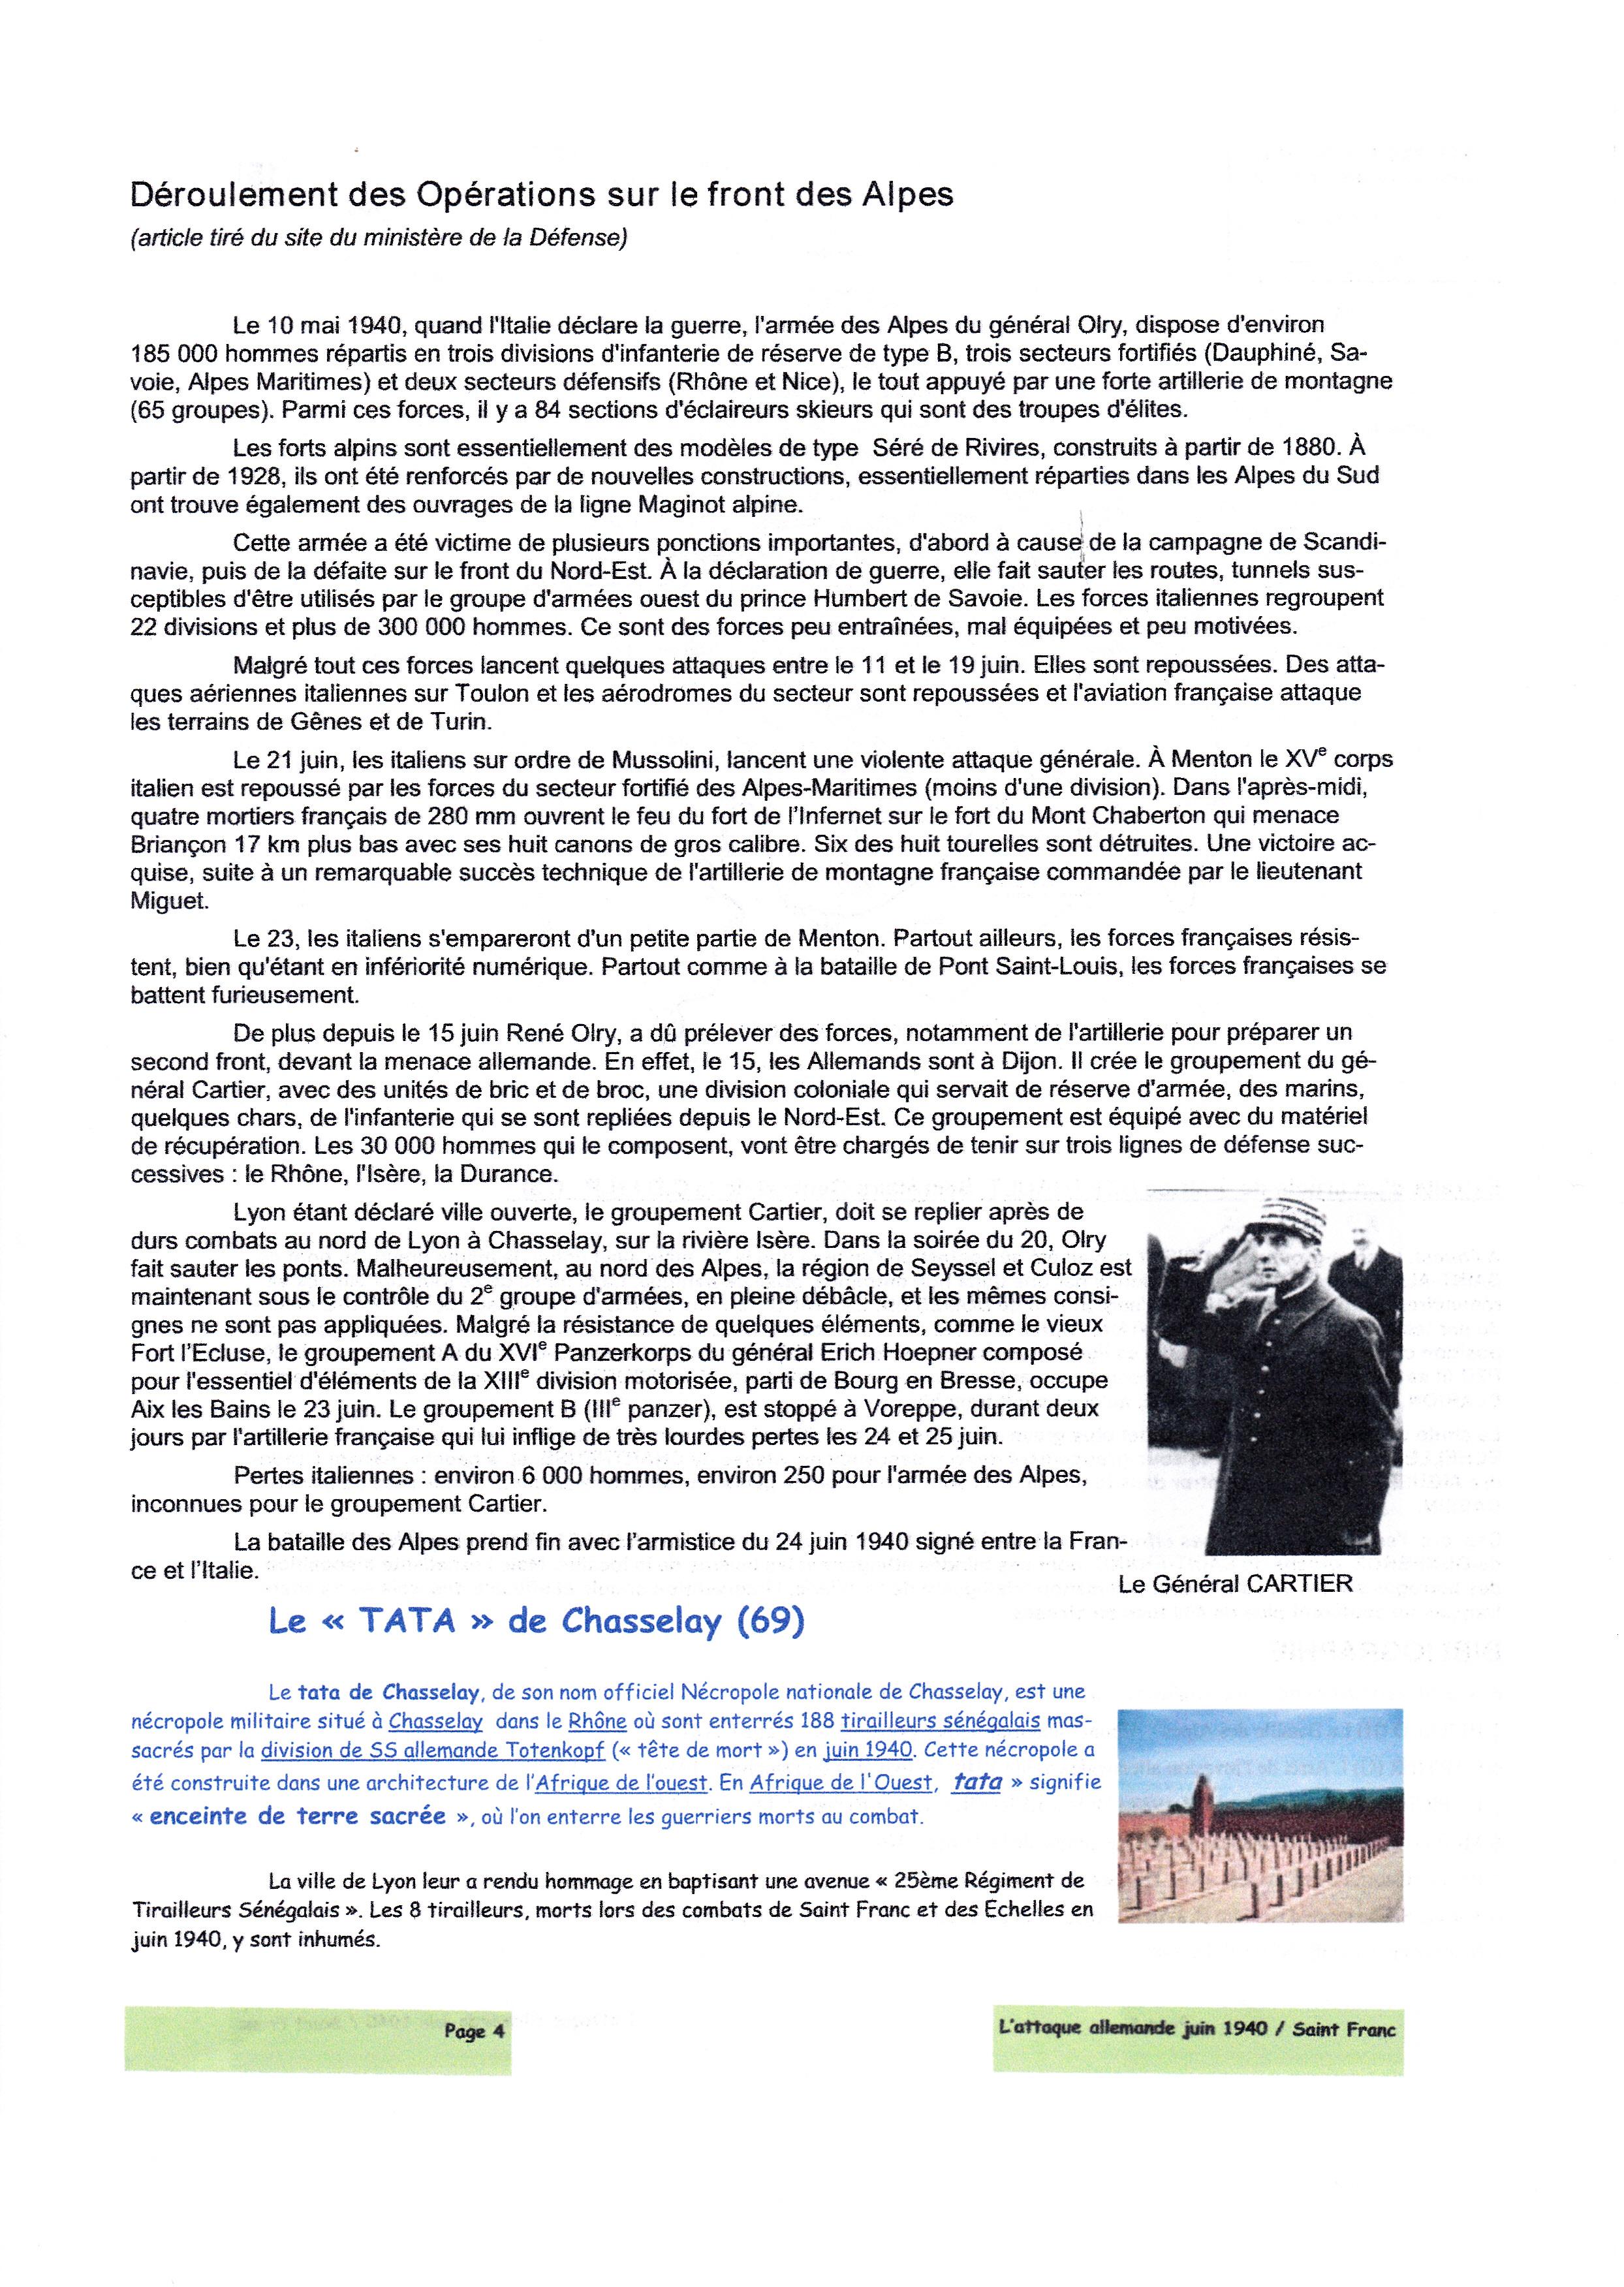 JUIN 1940 - Page 4